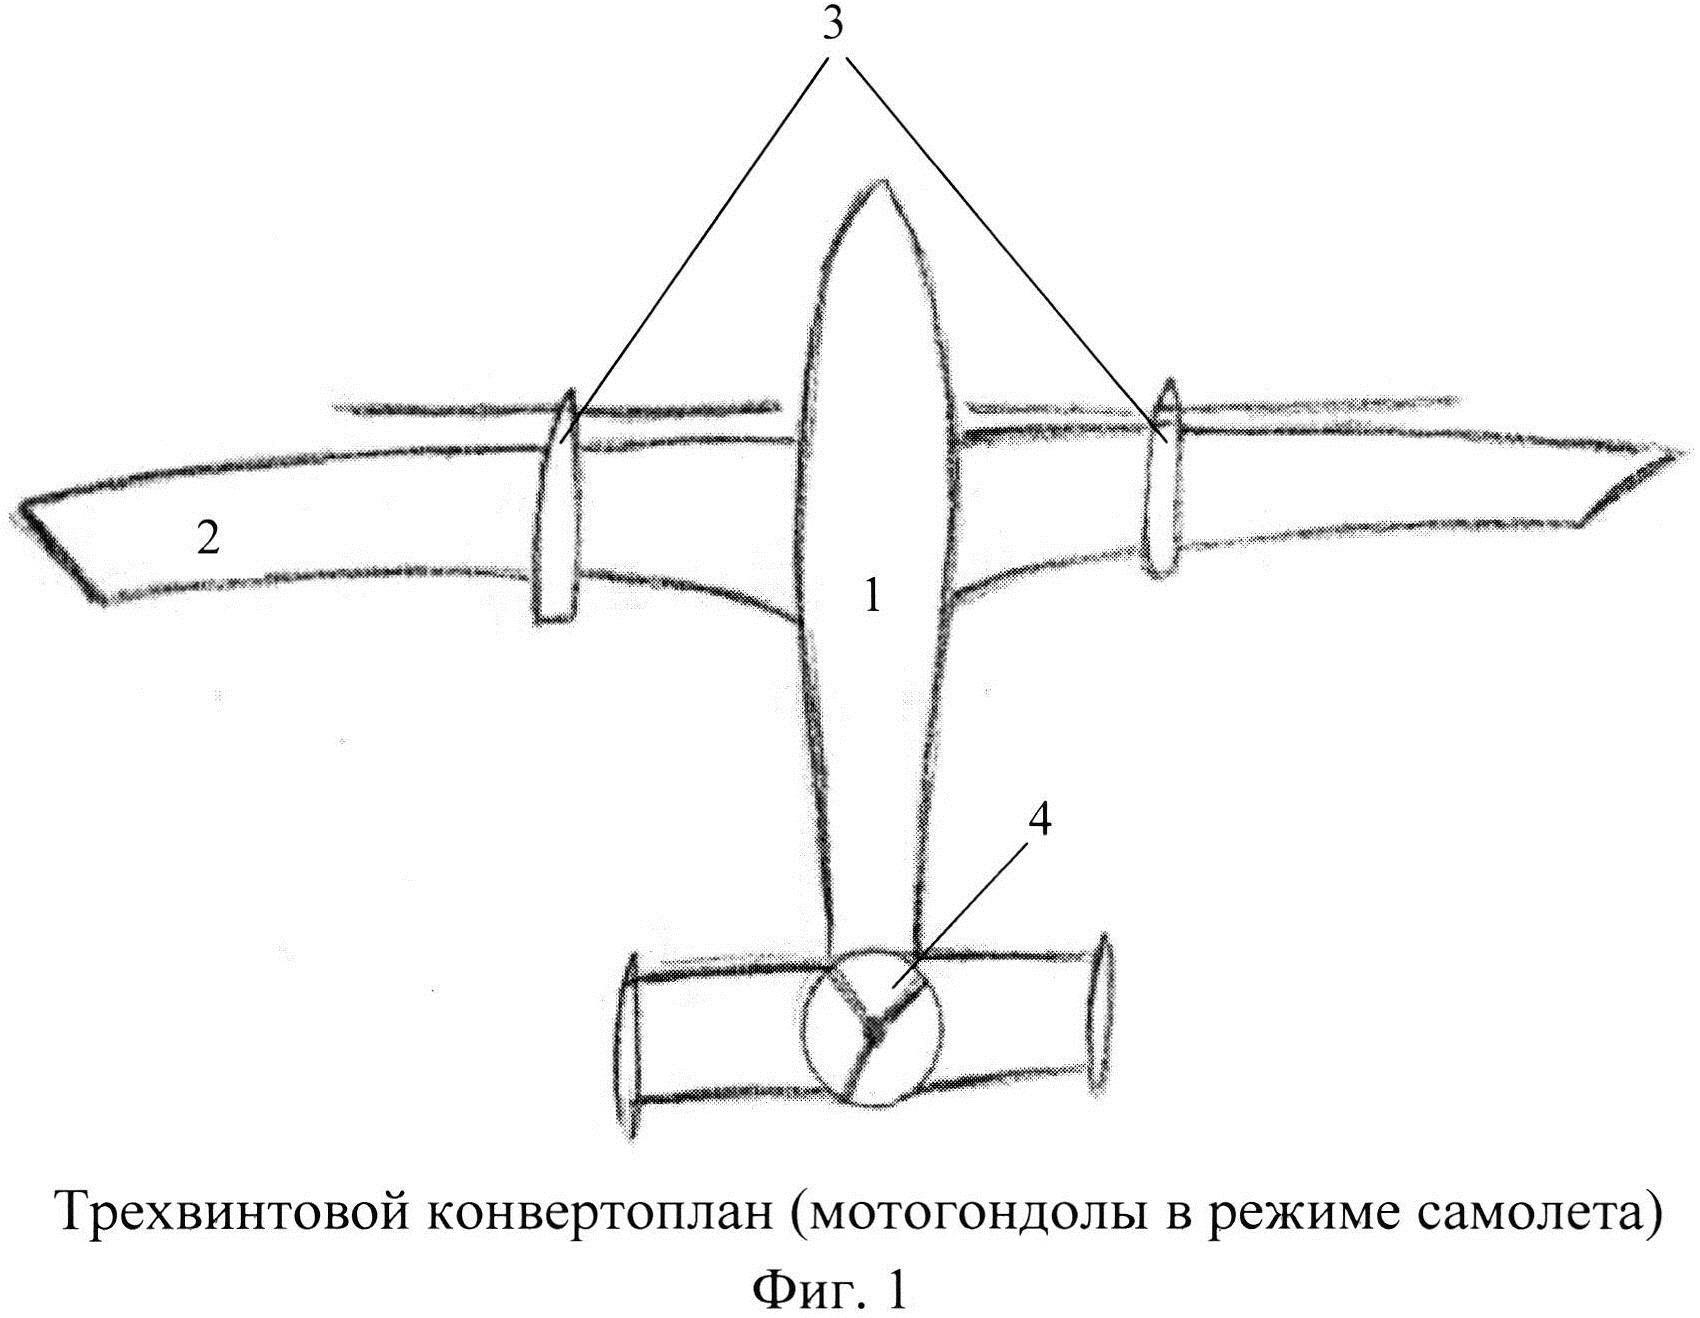 Трехвинтовой конвертоплан